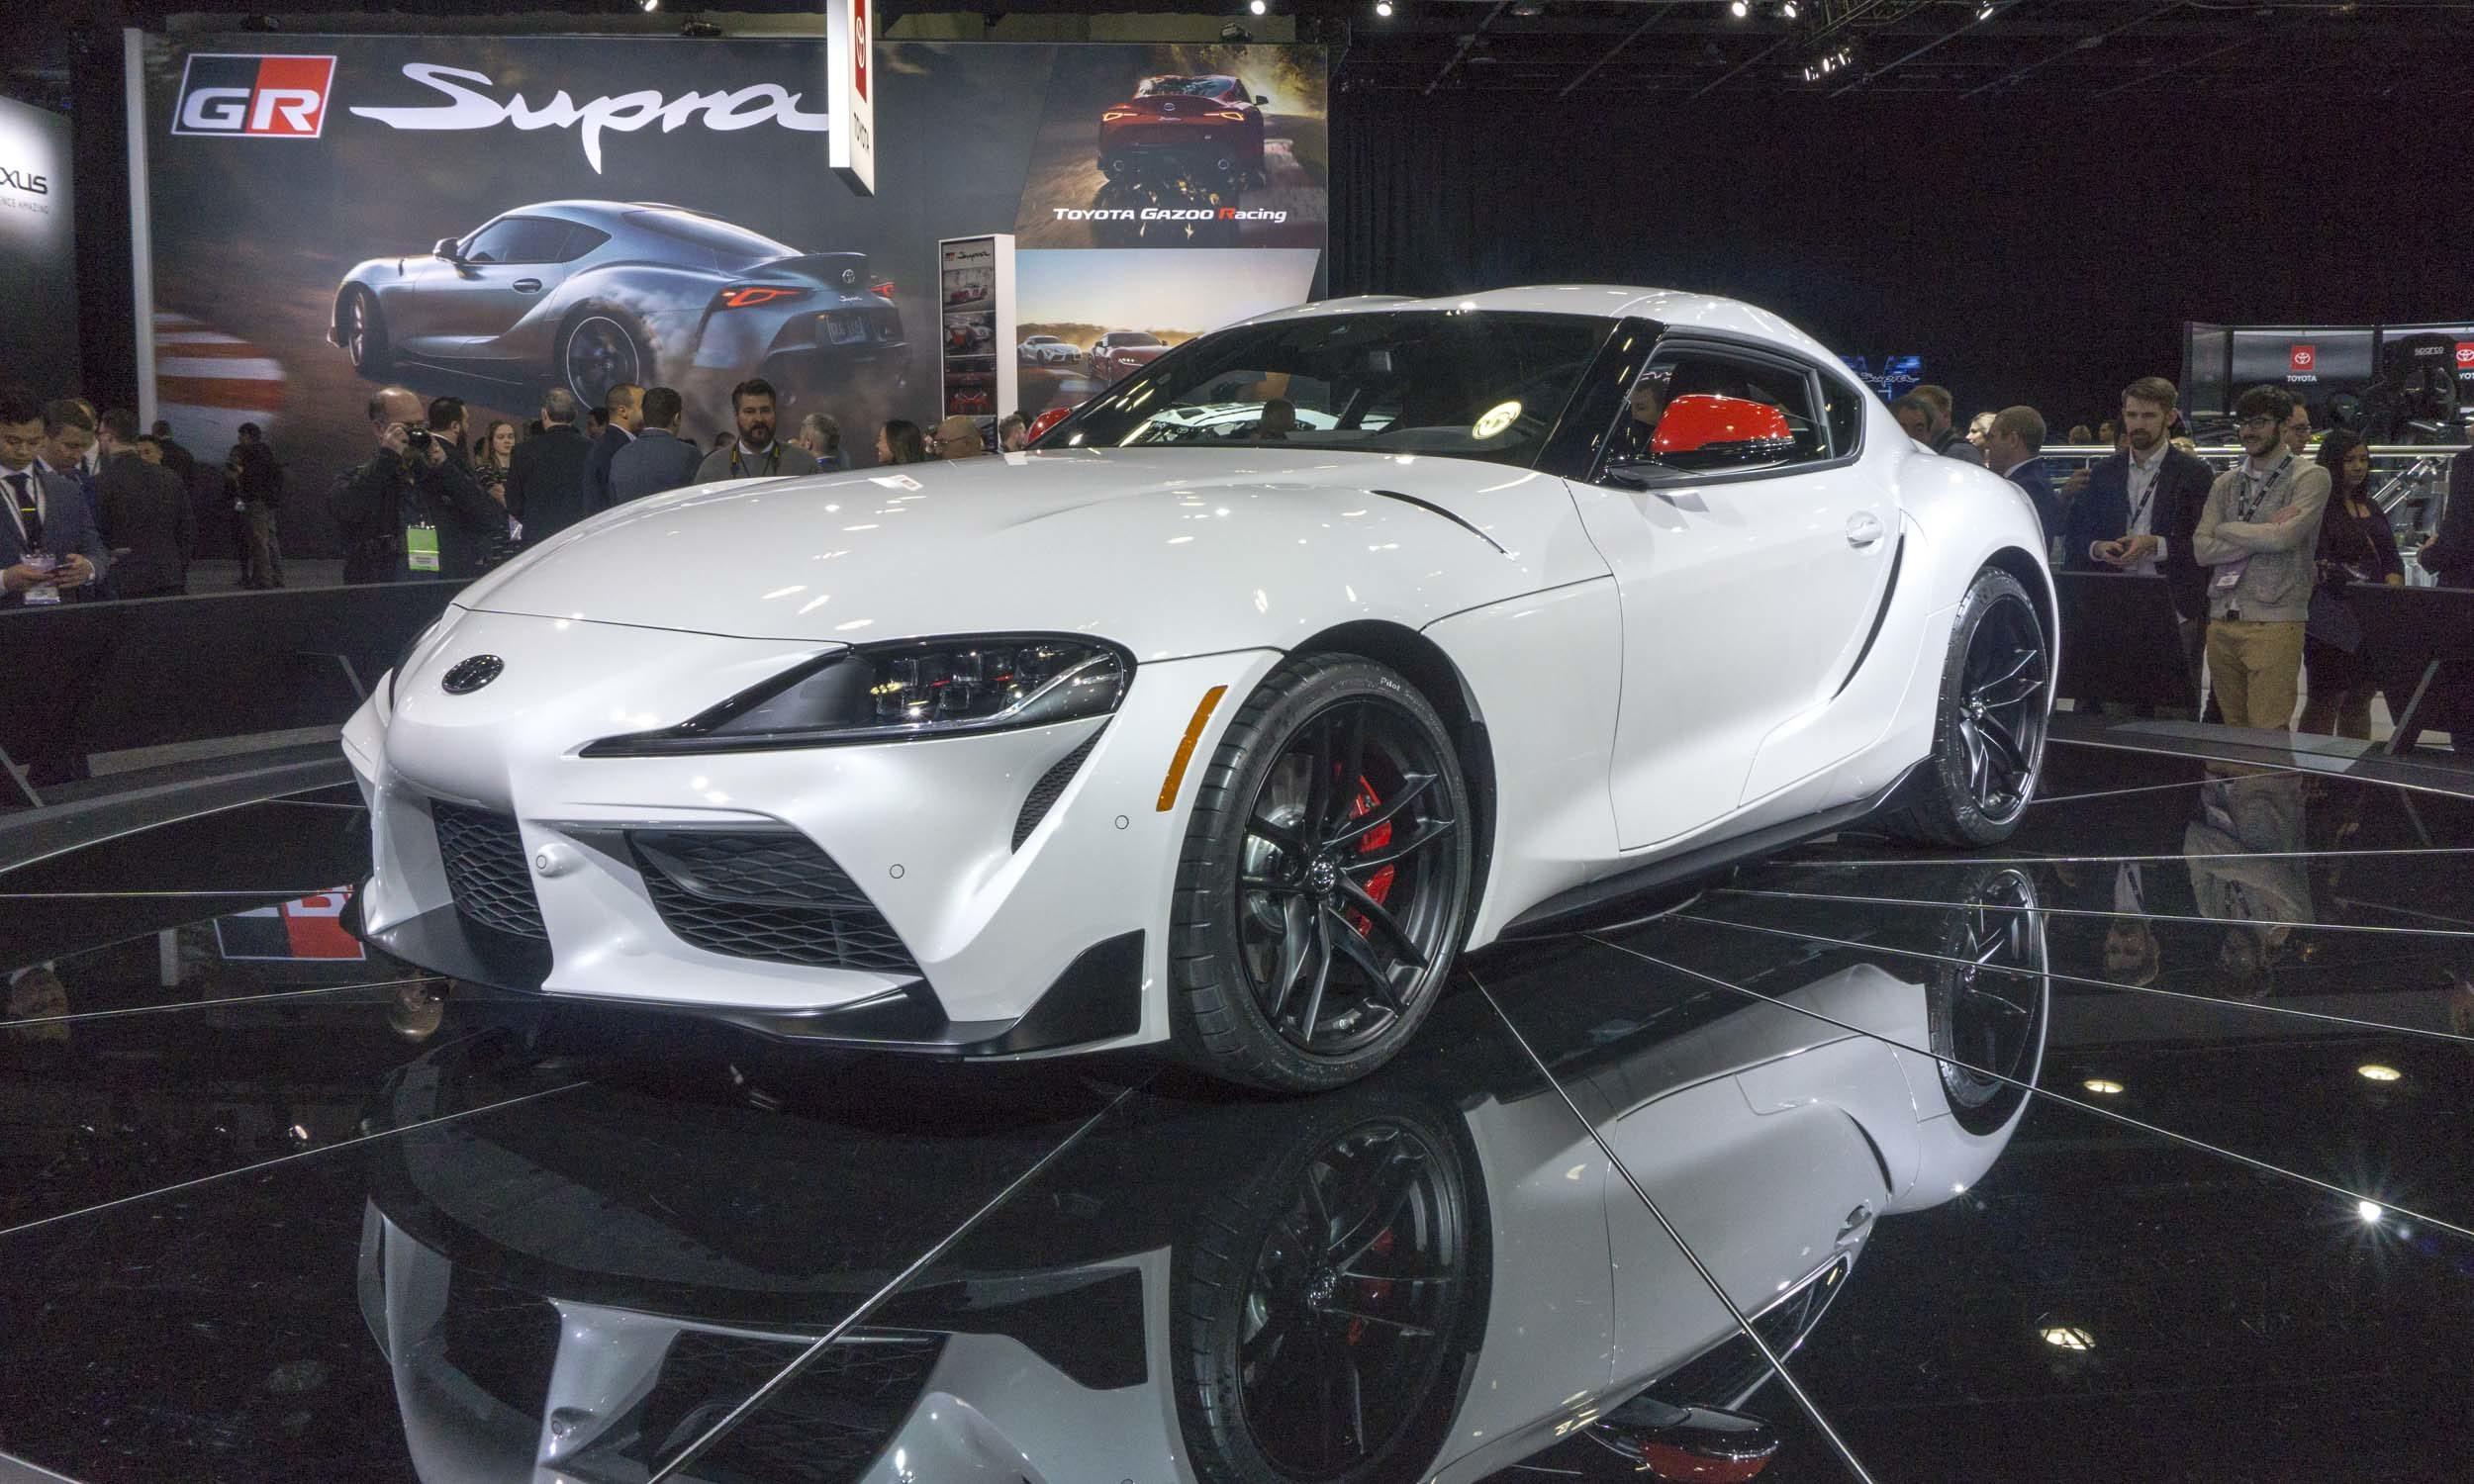 2020-Toyota-Supra1.jpg